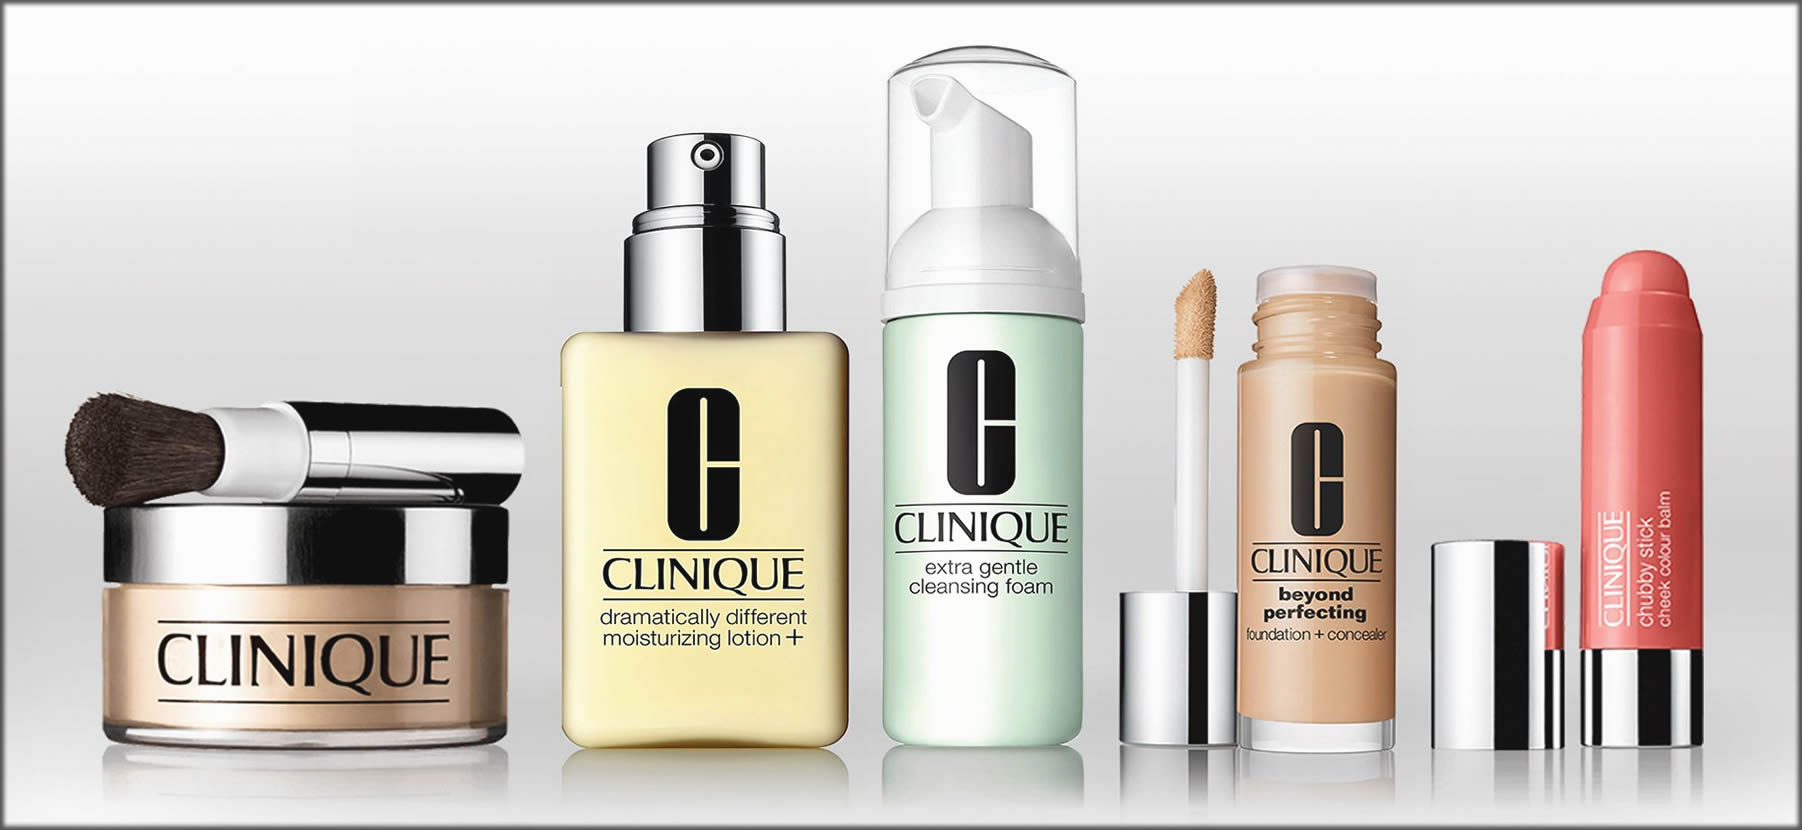 Clinique Makeup And Skincare